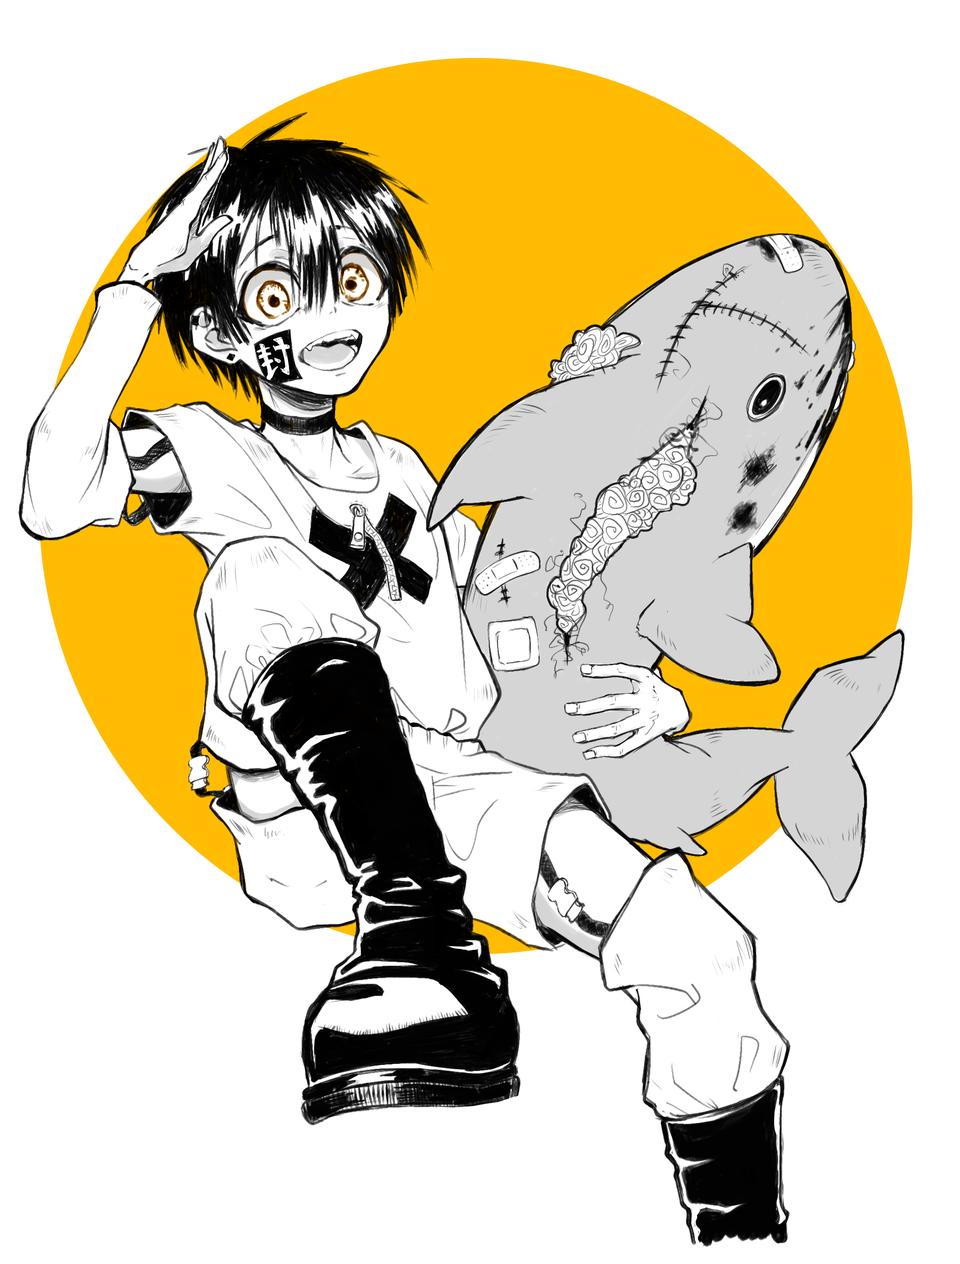 Tsukasa Illust of nikuoni medibangpaint Toilet-boundHanako-kun Yugitsukasa Shark smile hanakokun